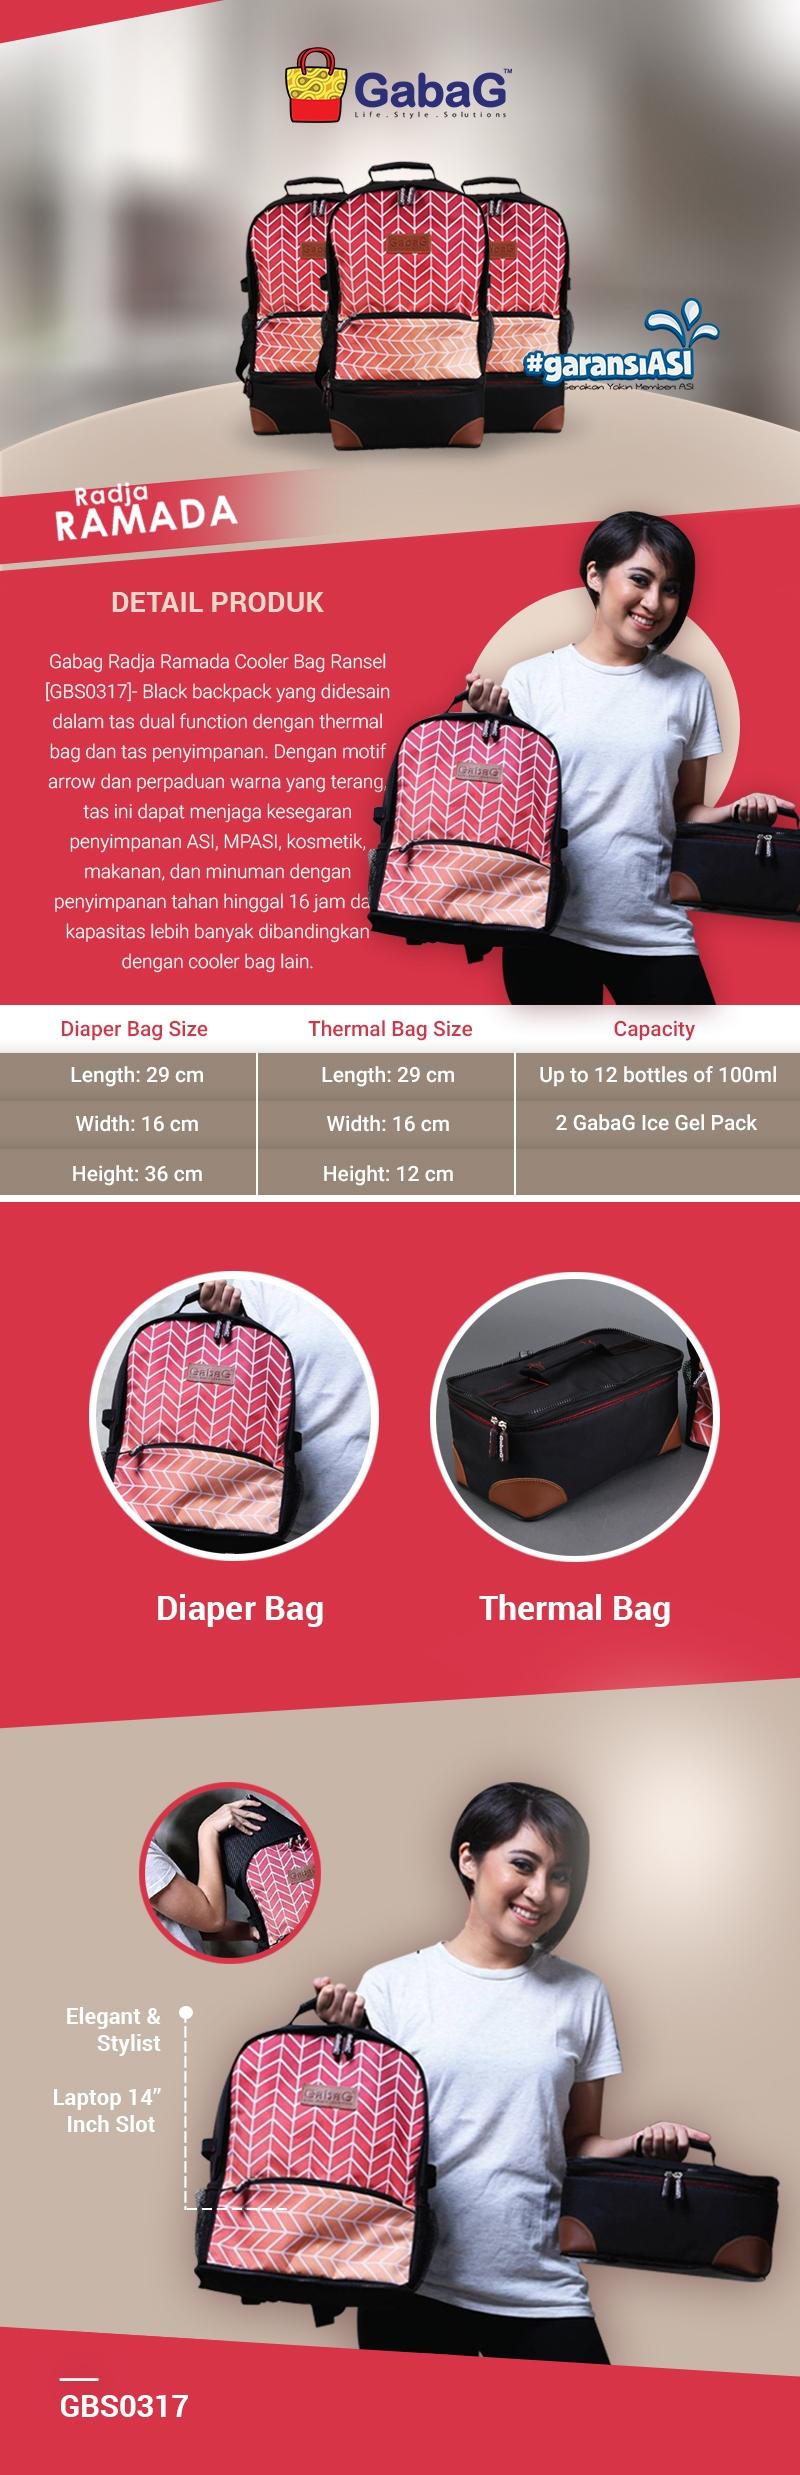 Gabag Radja Ramada Cooler Bags Backpack 2 In 1 Detail Info Produk